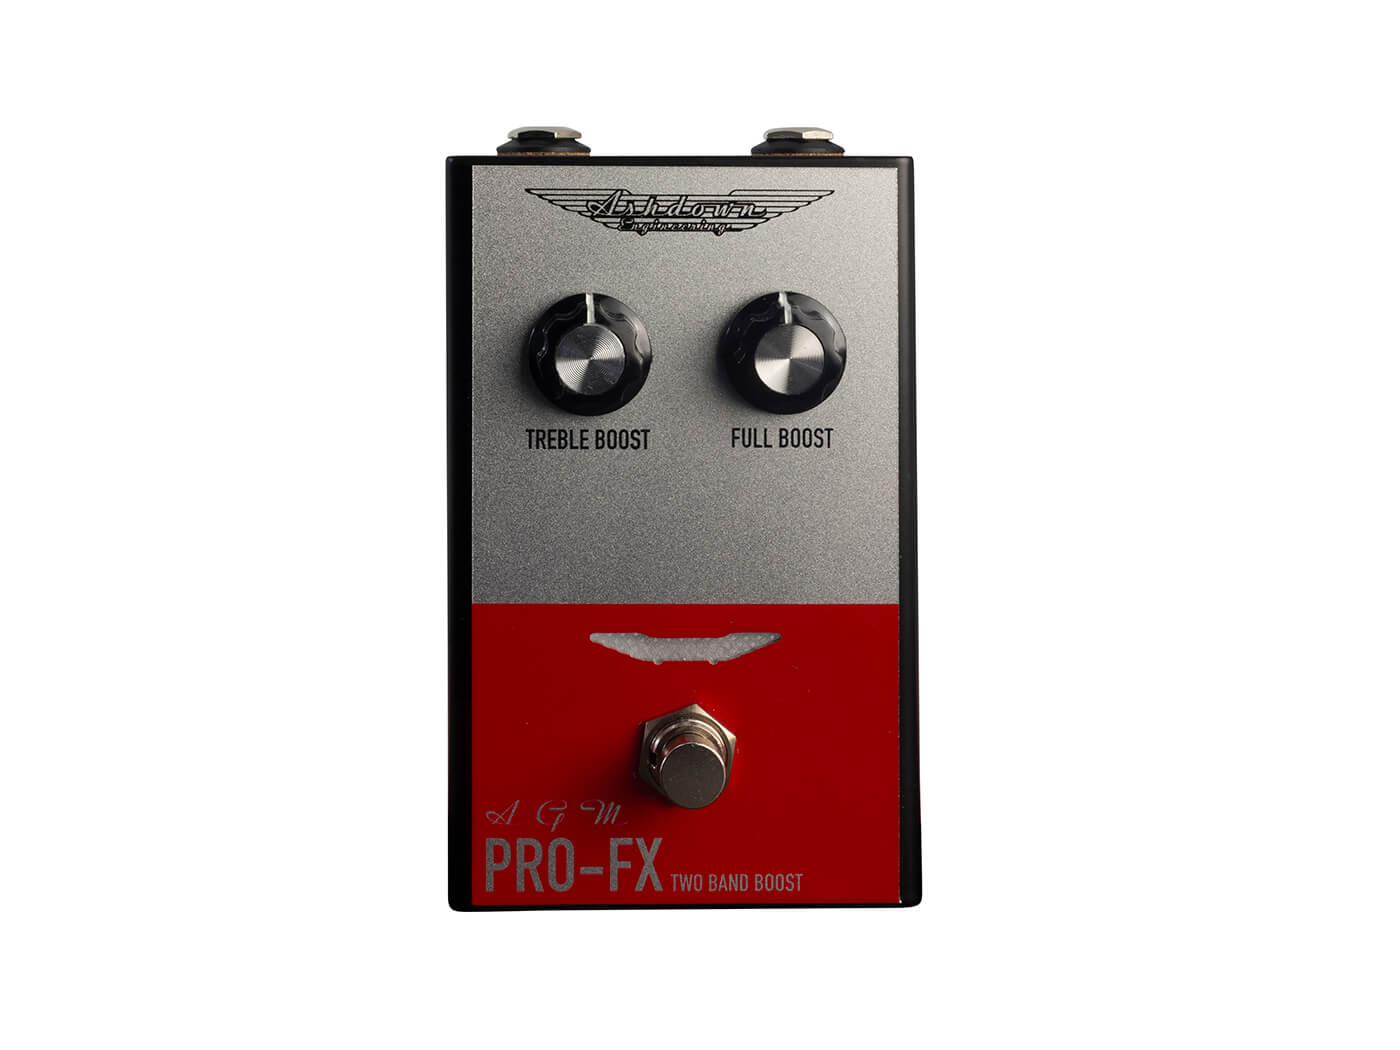 Ashdown PRO-FX Two Band Boost